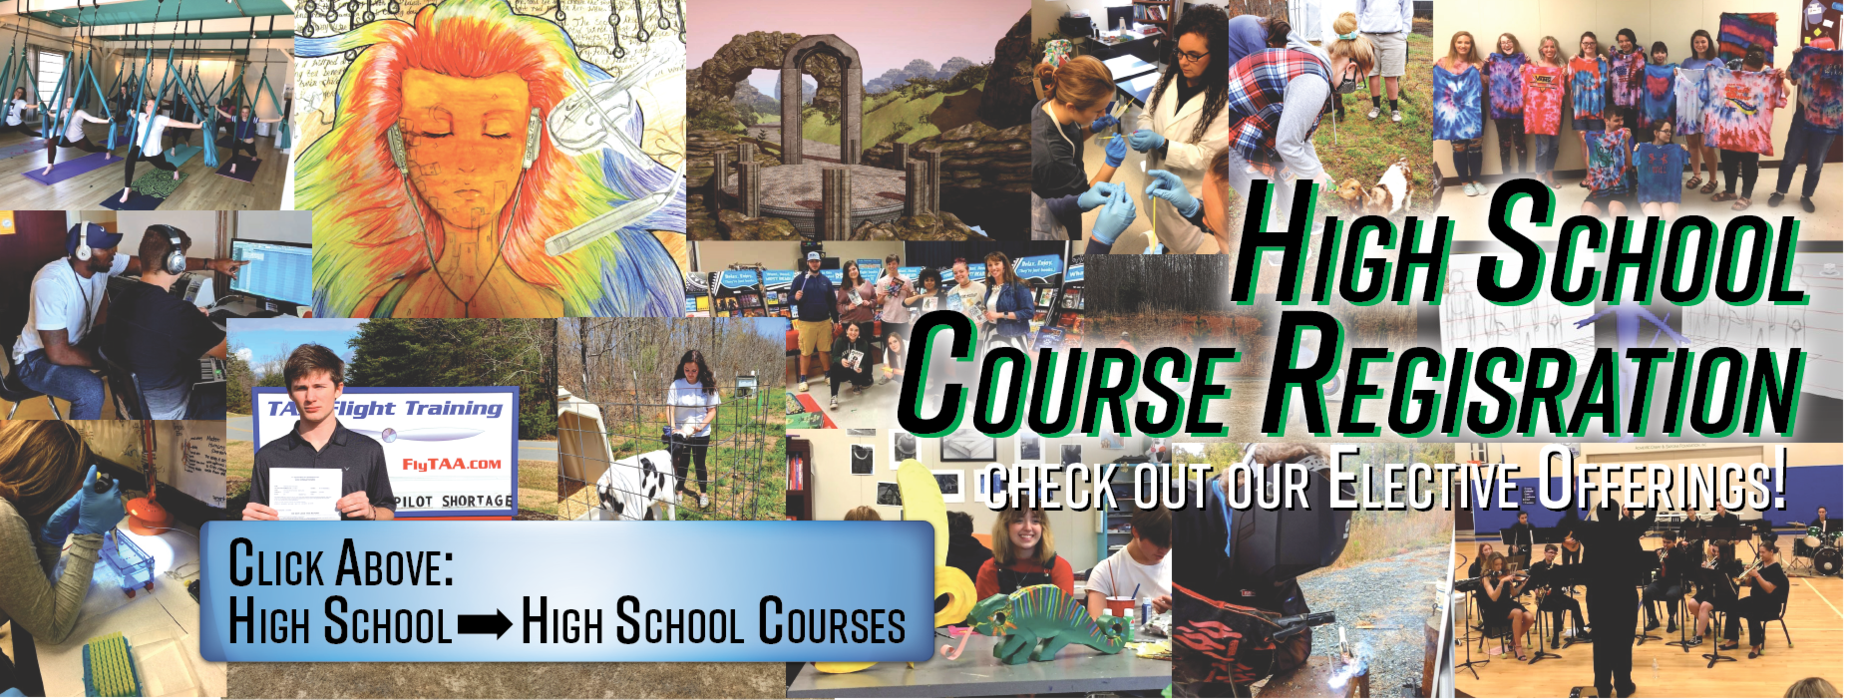 High School Course Registration is Open